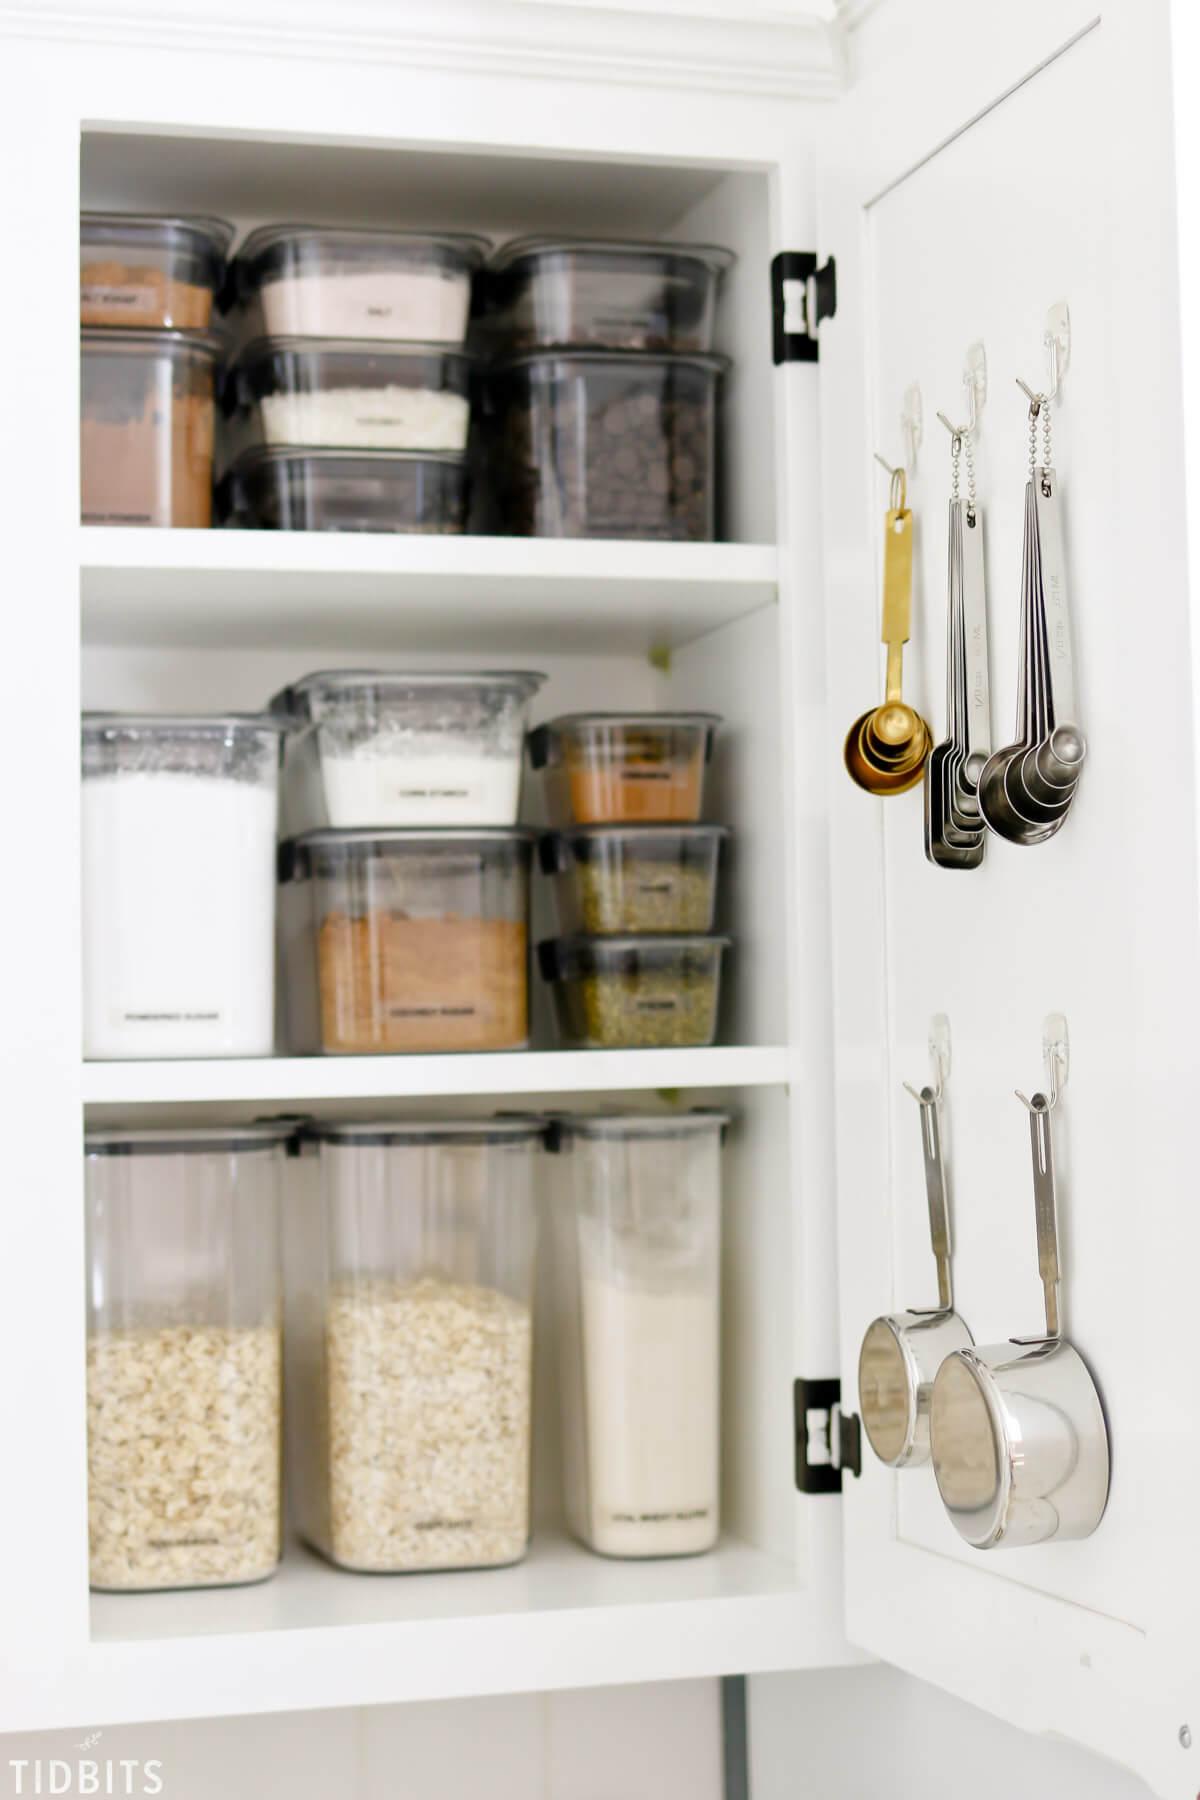 Kitchen-cabinet-organization-ideas-hanging-hooks